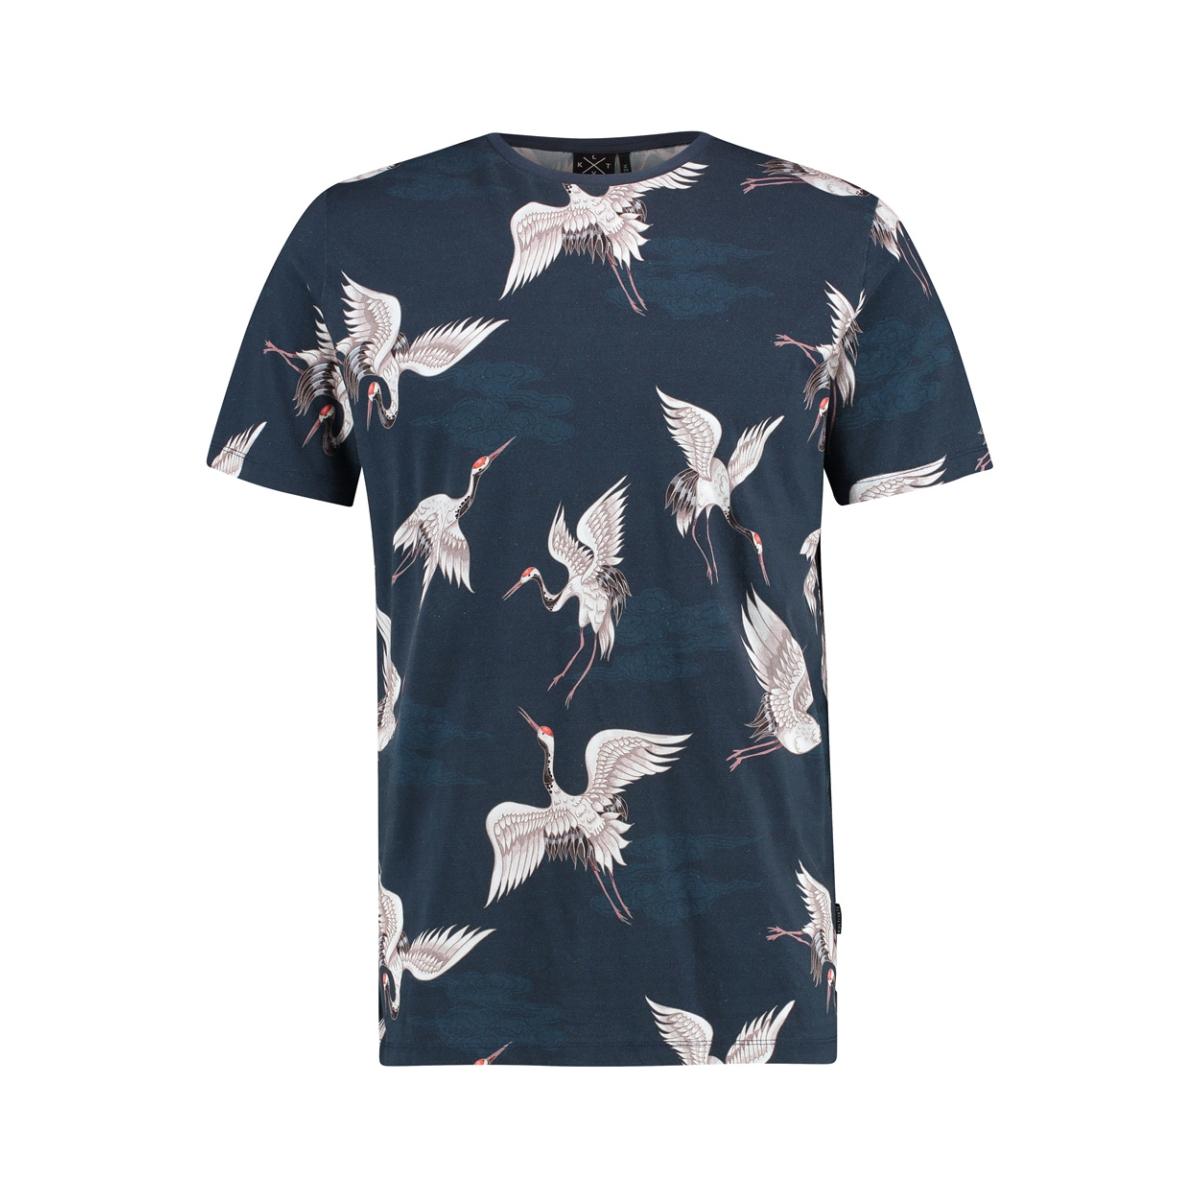 ts crane 1901020216 kultivate t-shirt 319 dark navy